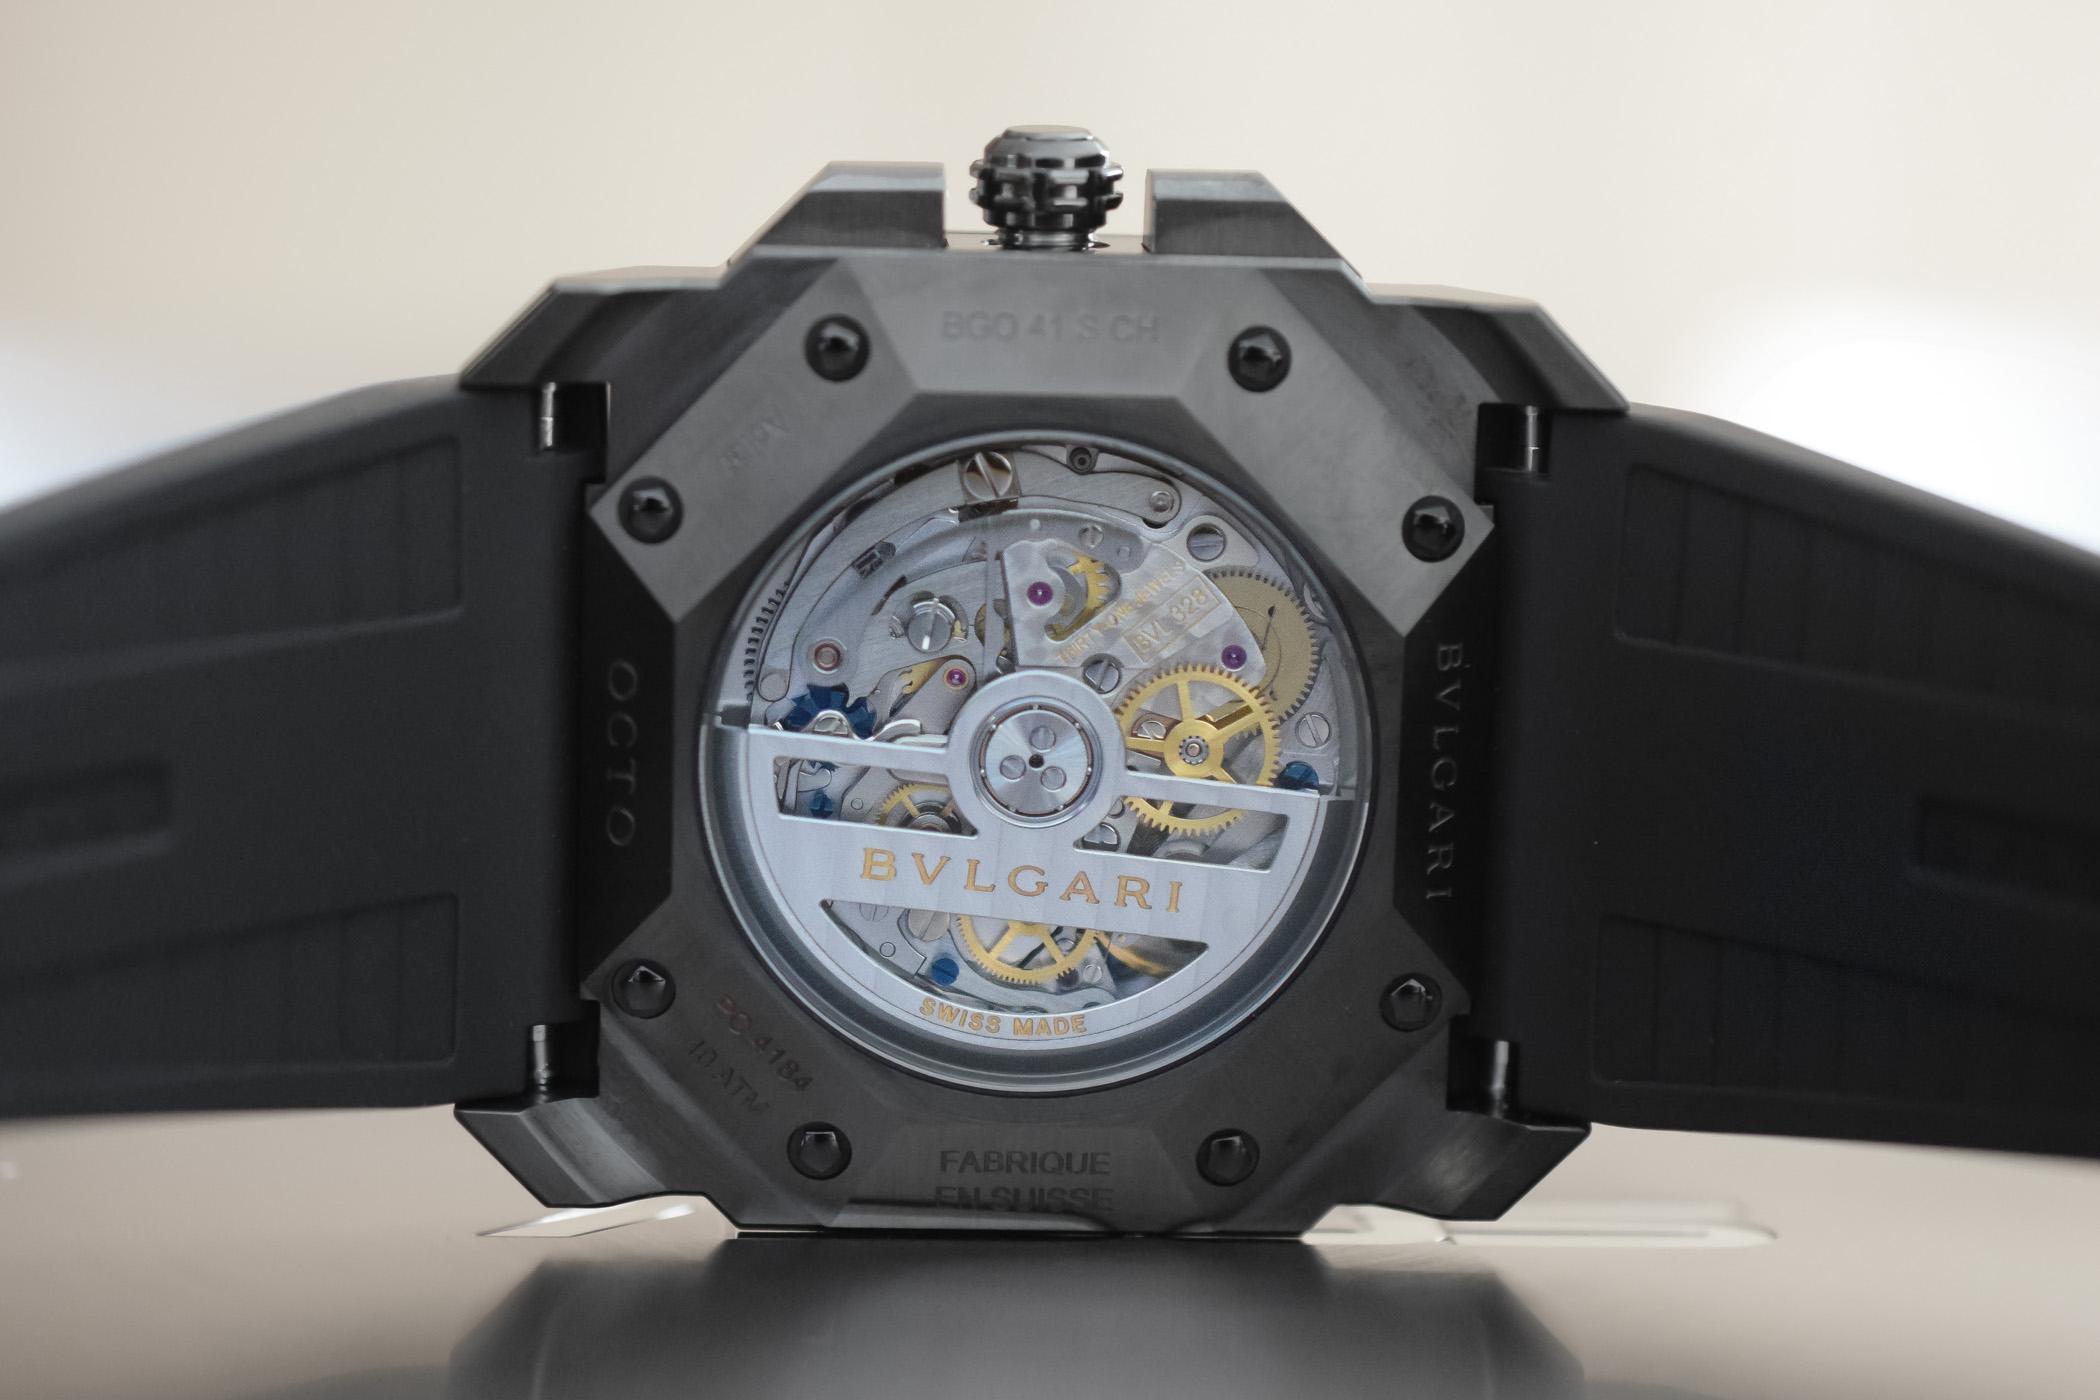 Bvlgari Octo L'originale Chronograph Black Edition